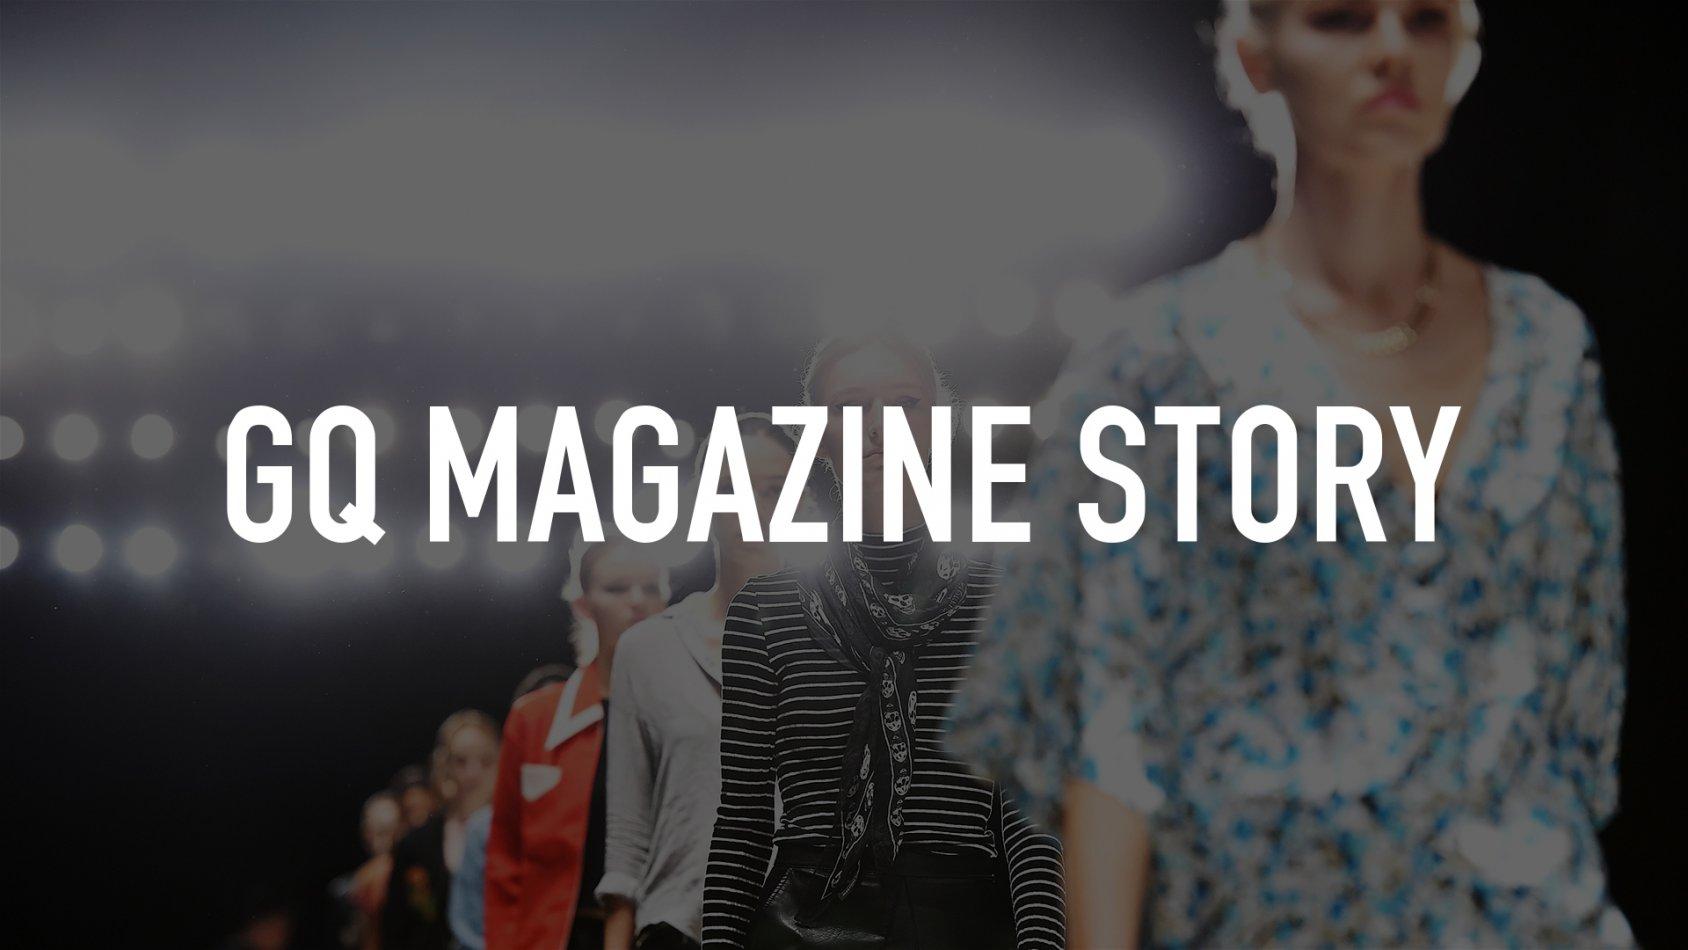 GQ Magazine Story